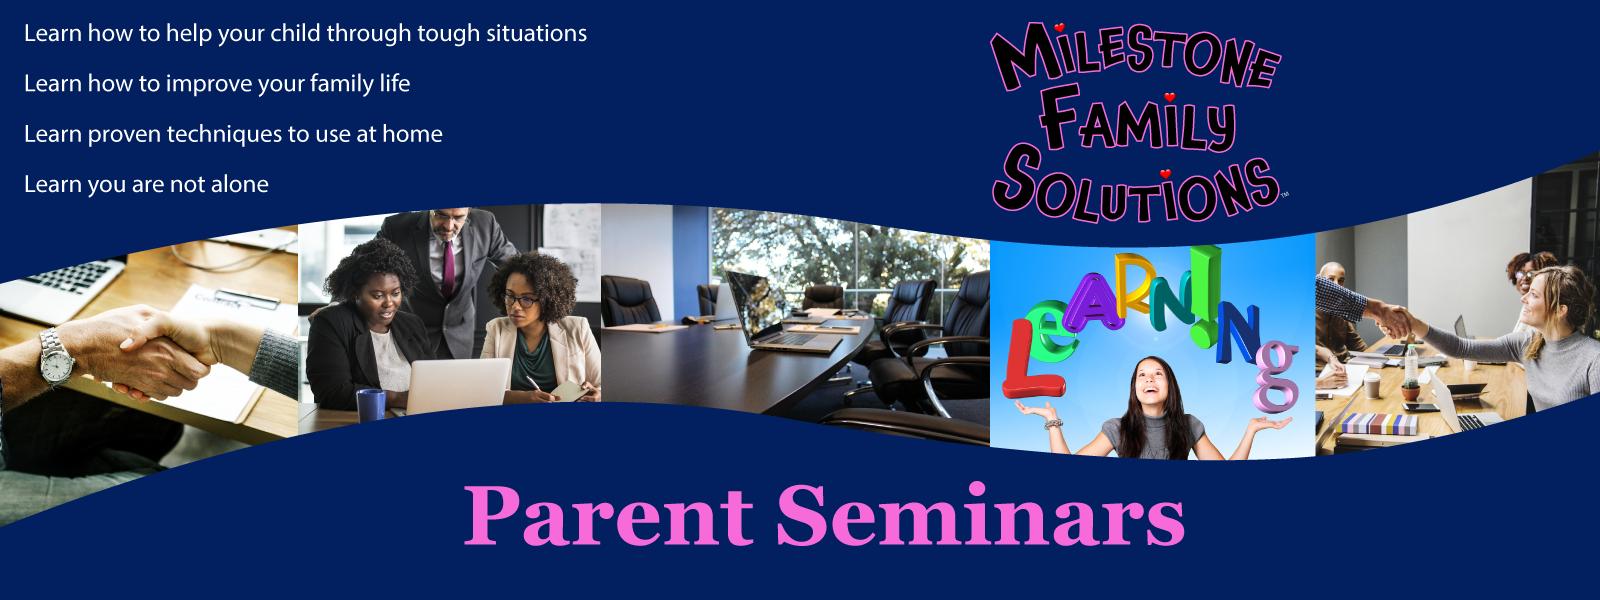 parent seminars header